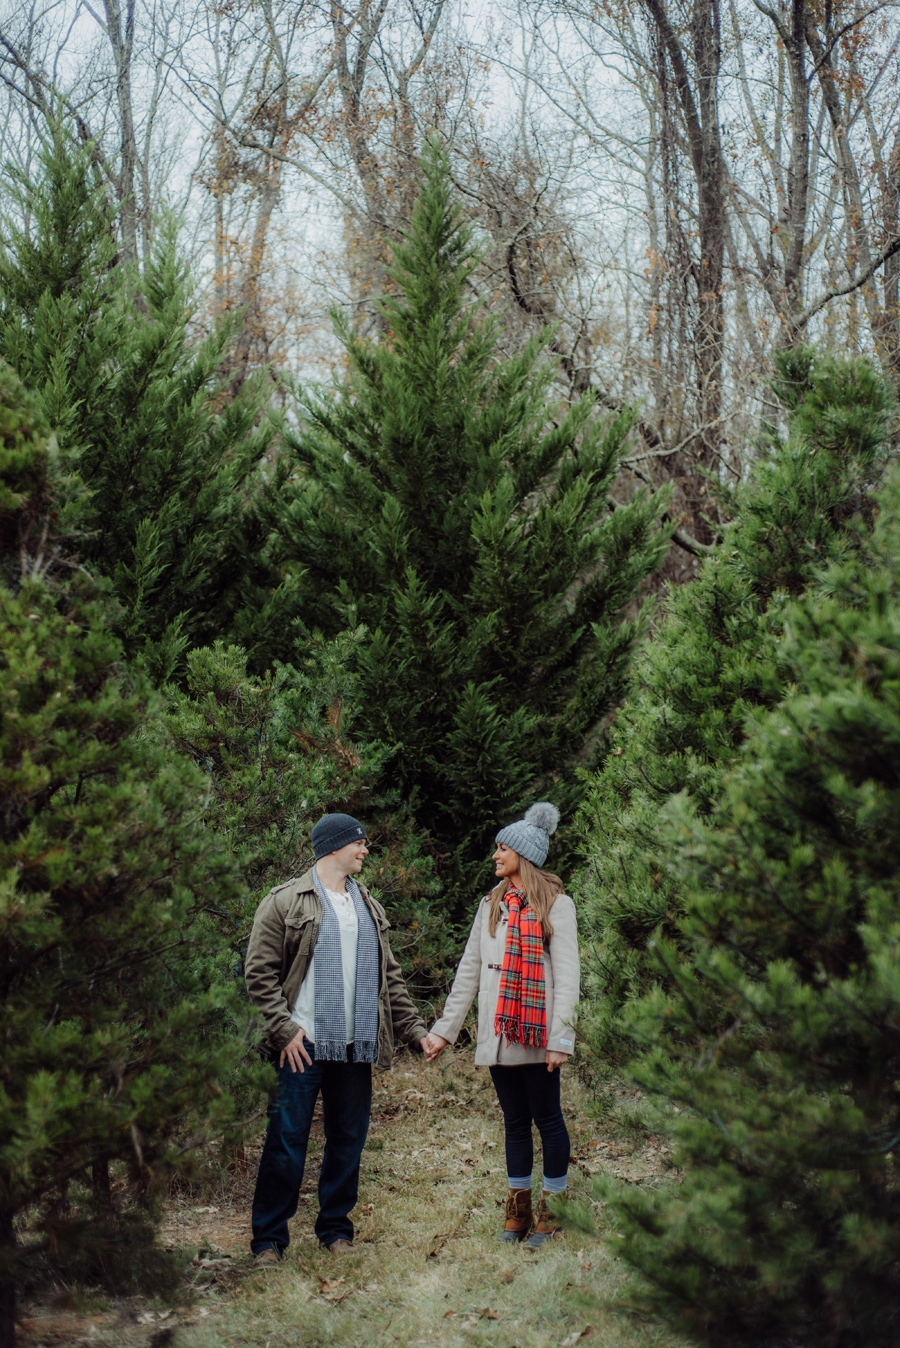 KrisandraEvans.com | Atlanta Engagement Photographer | Minters Christmas Tree Farm